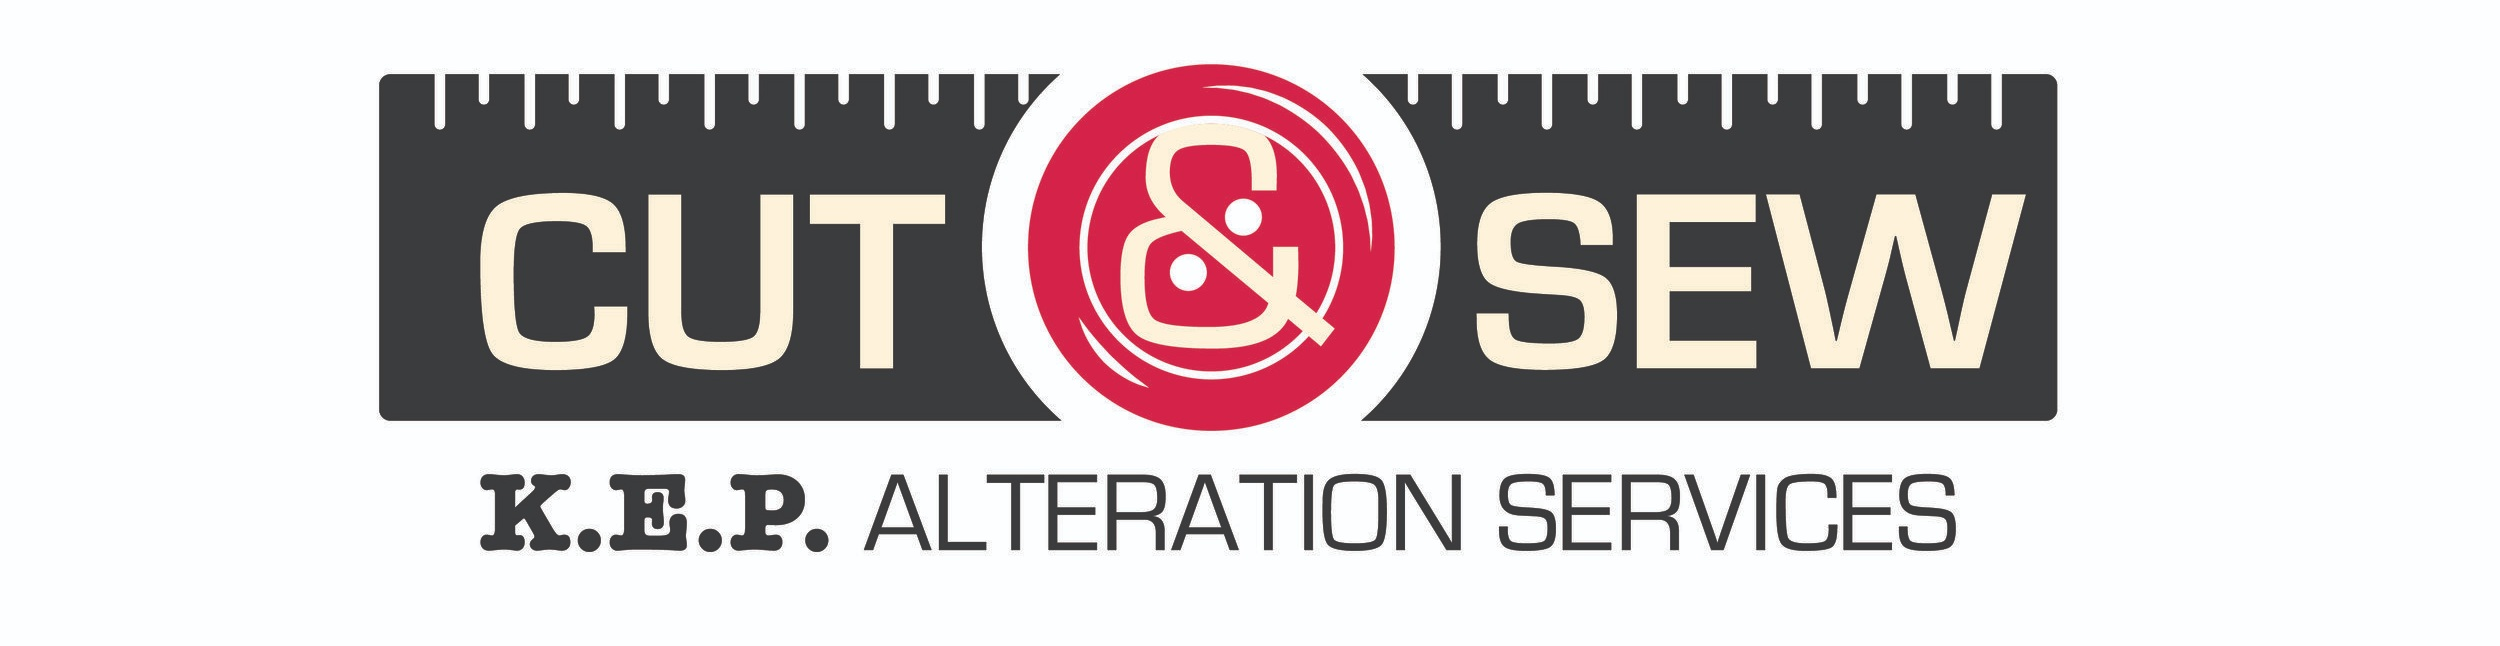 Cut+%26+Sew+Logo+Final+-+high+res.jpg